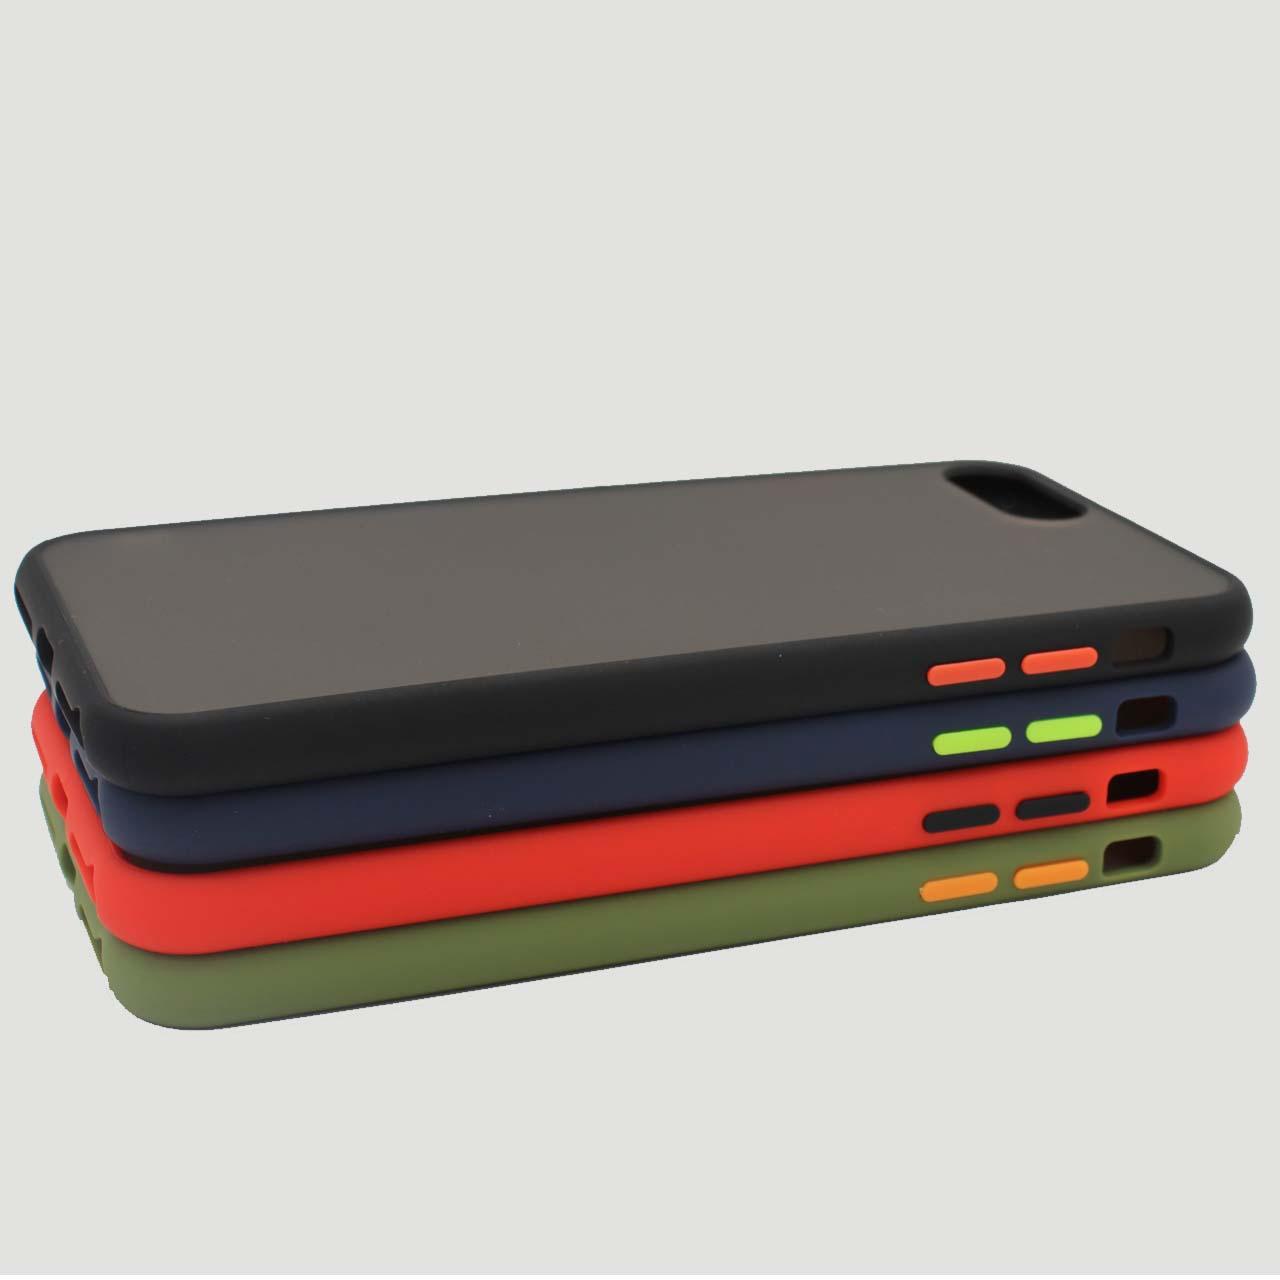 کاور کینگ پاور مدل M21 مناسب برای گوشی موبایل اپل iPhone 7 Plus/ 8 Plus main 1 7